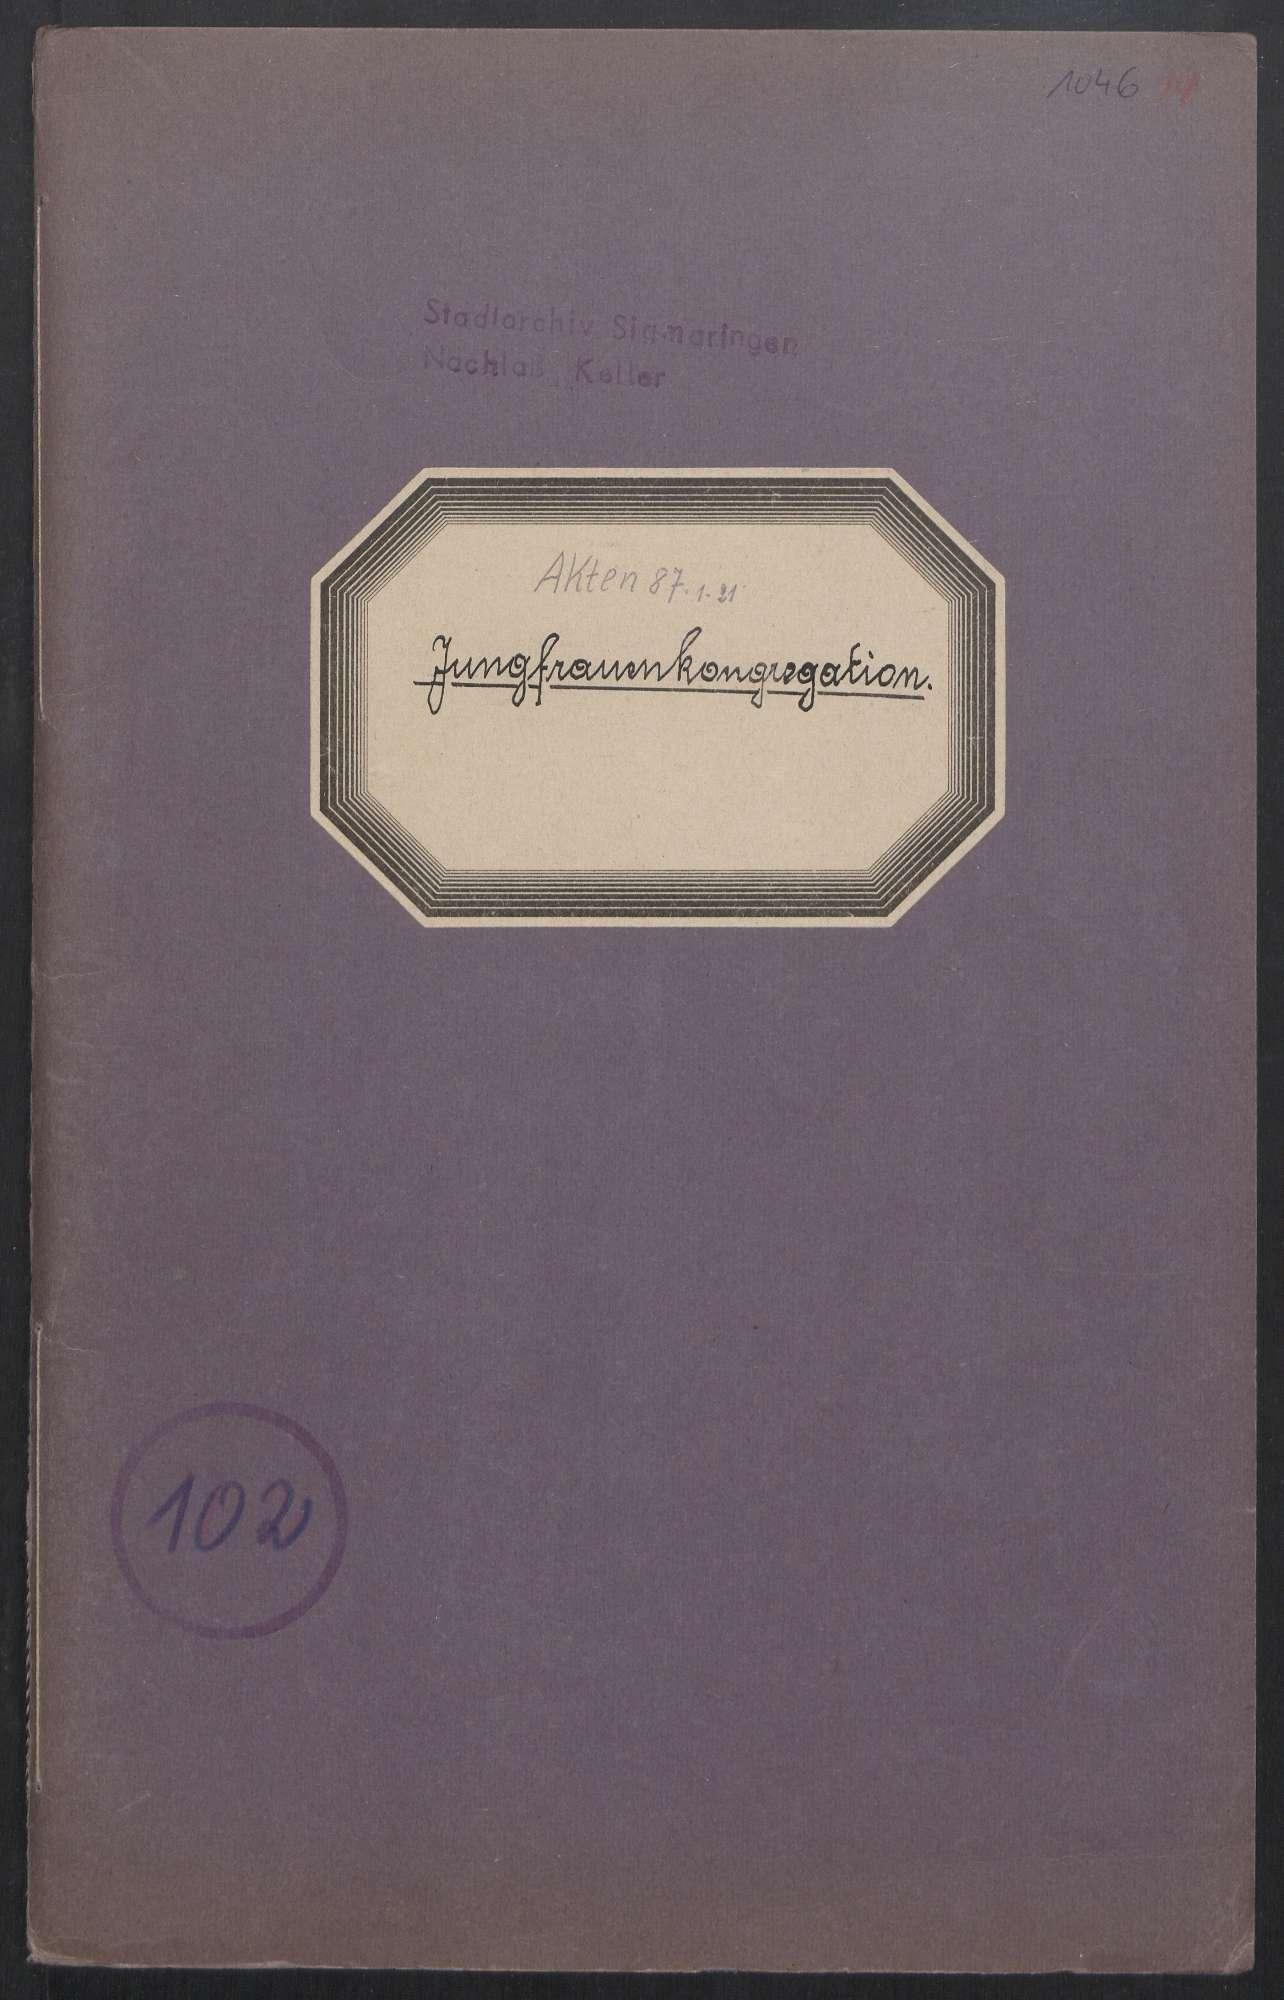 Jungfrauenkongregation (1850 - 1946), Bild 1